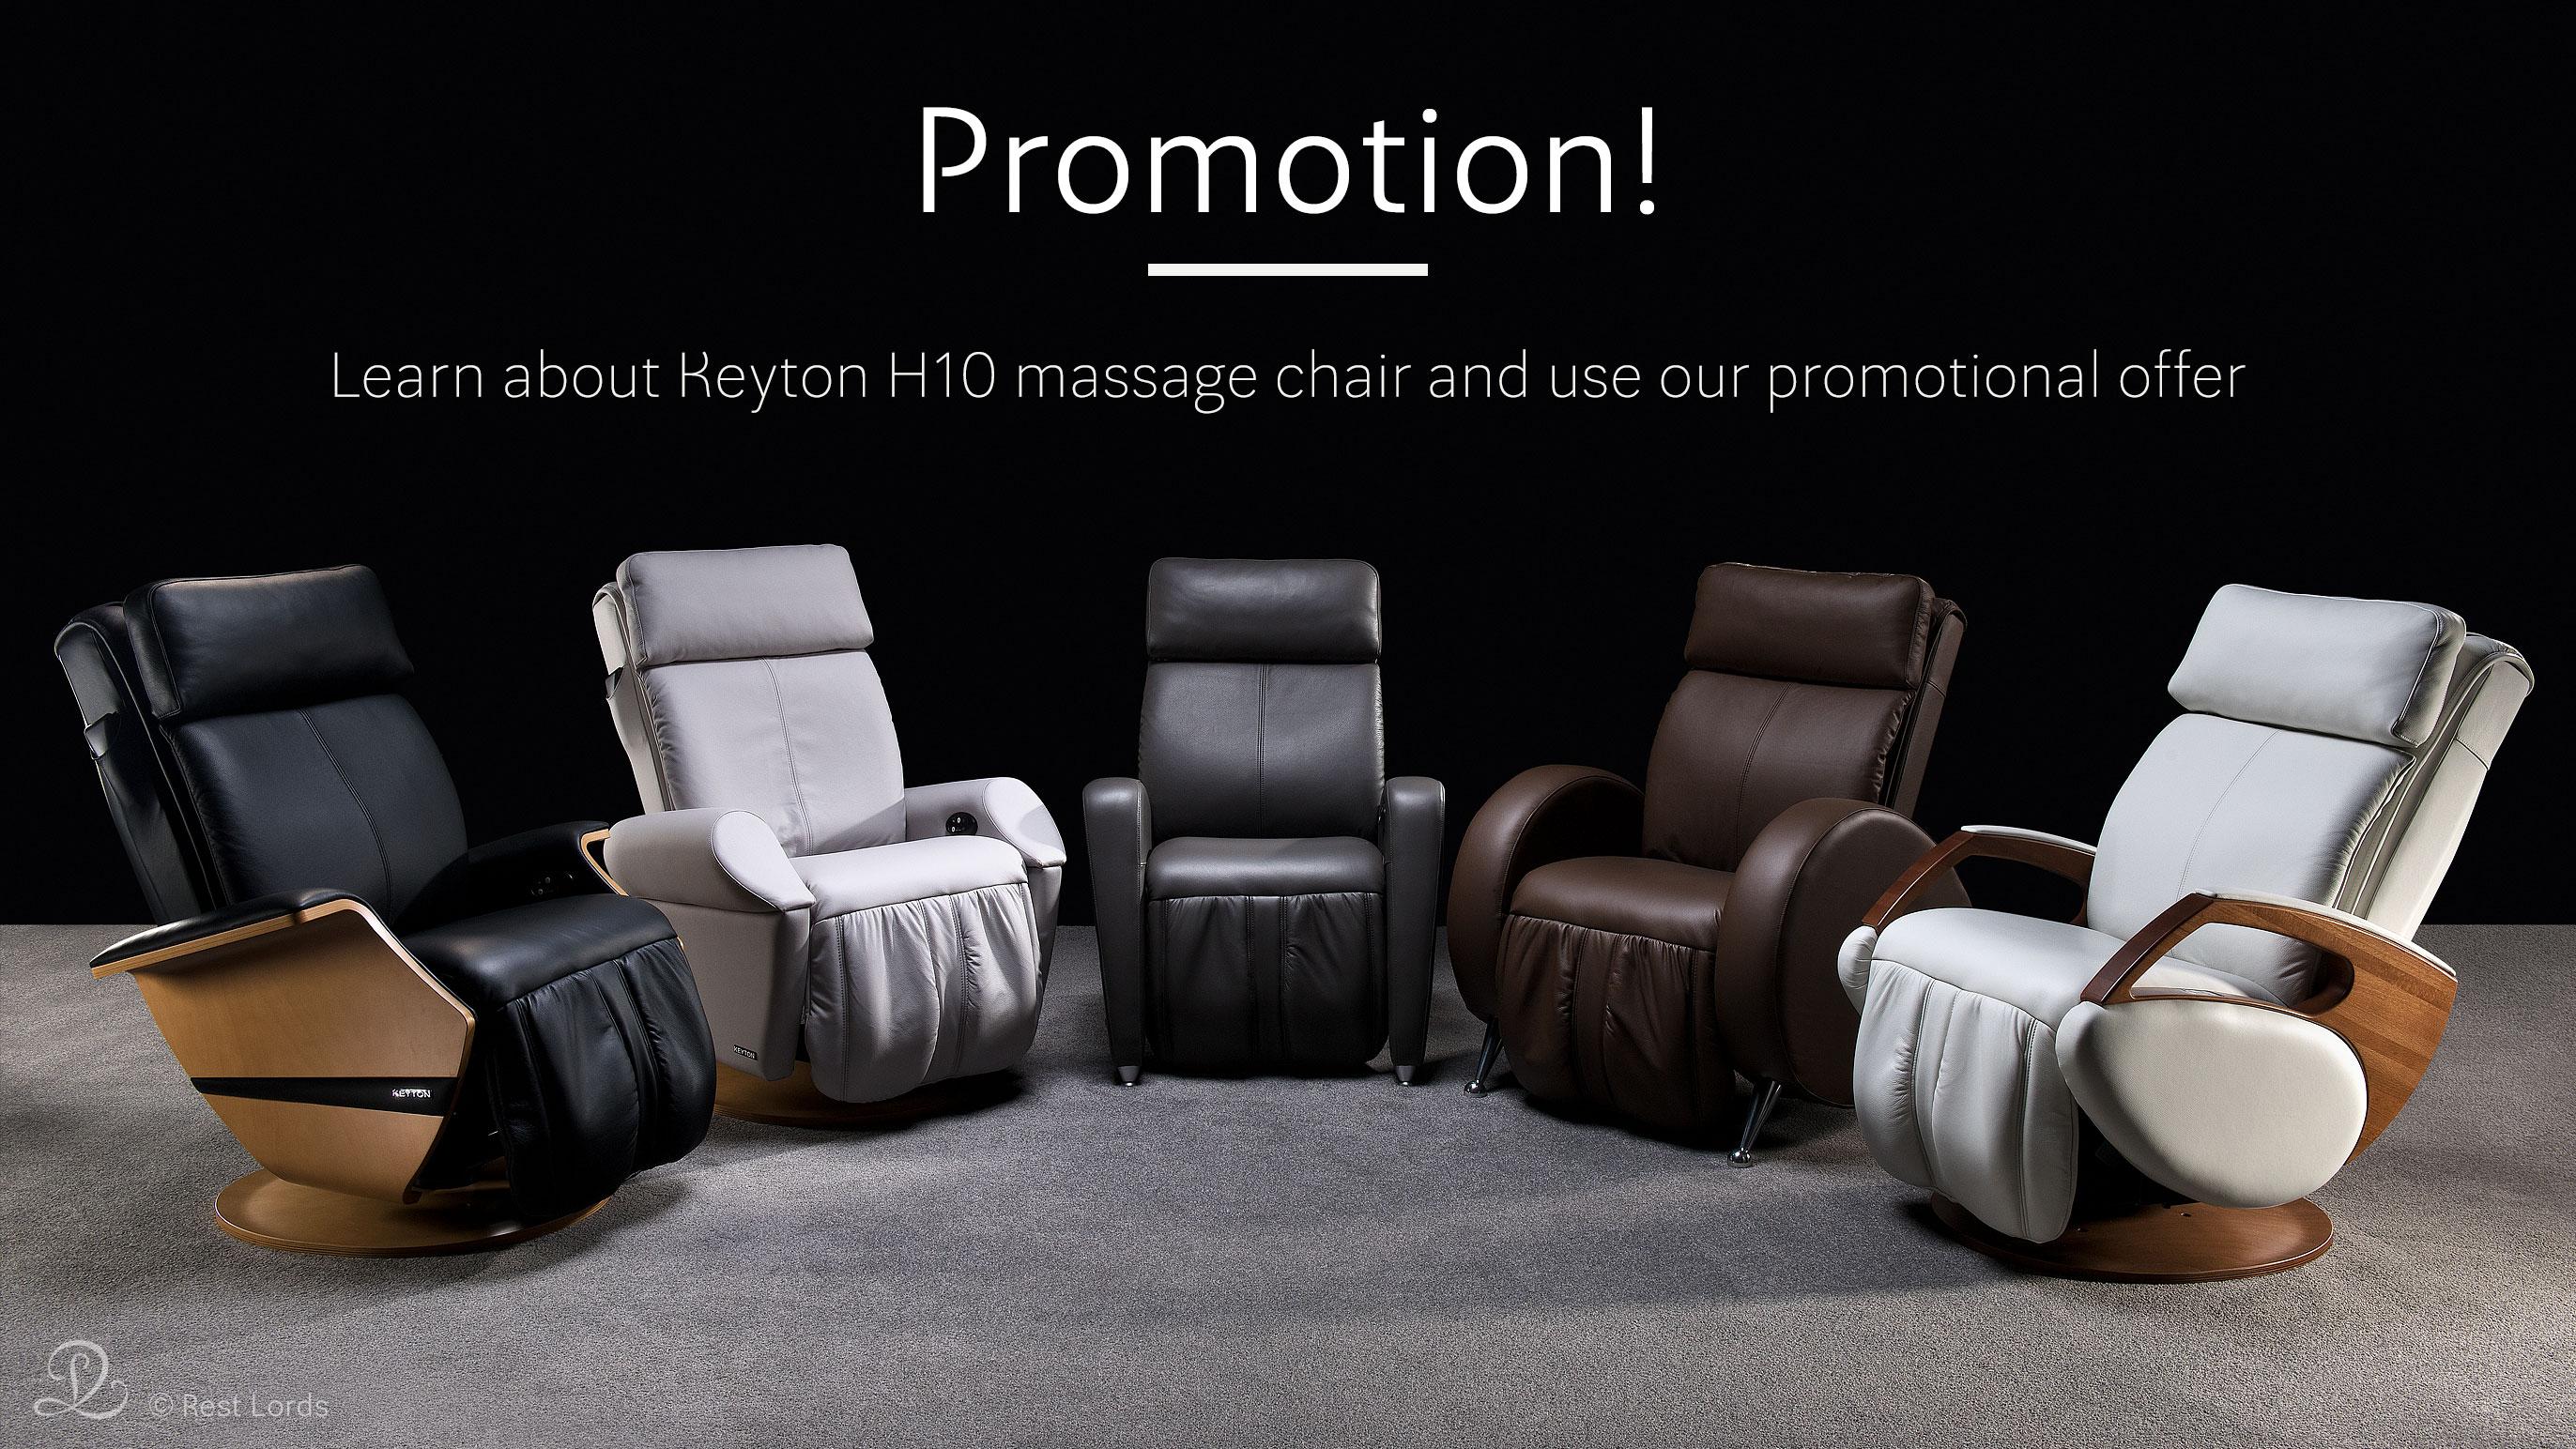 Massage chair Keyton H10 on sale promotion